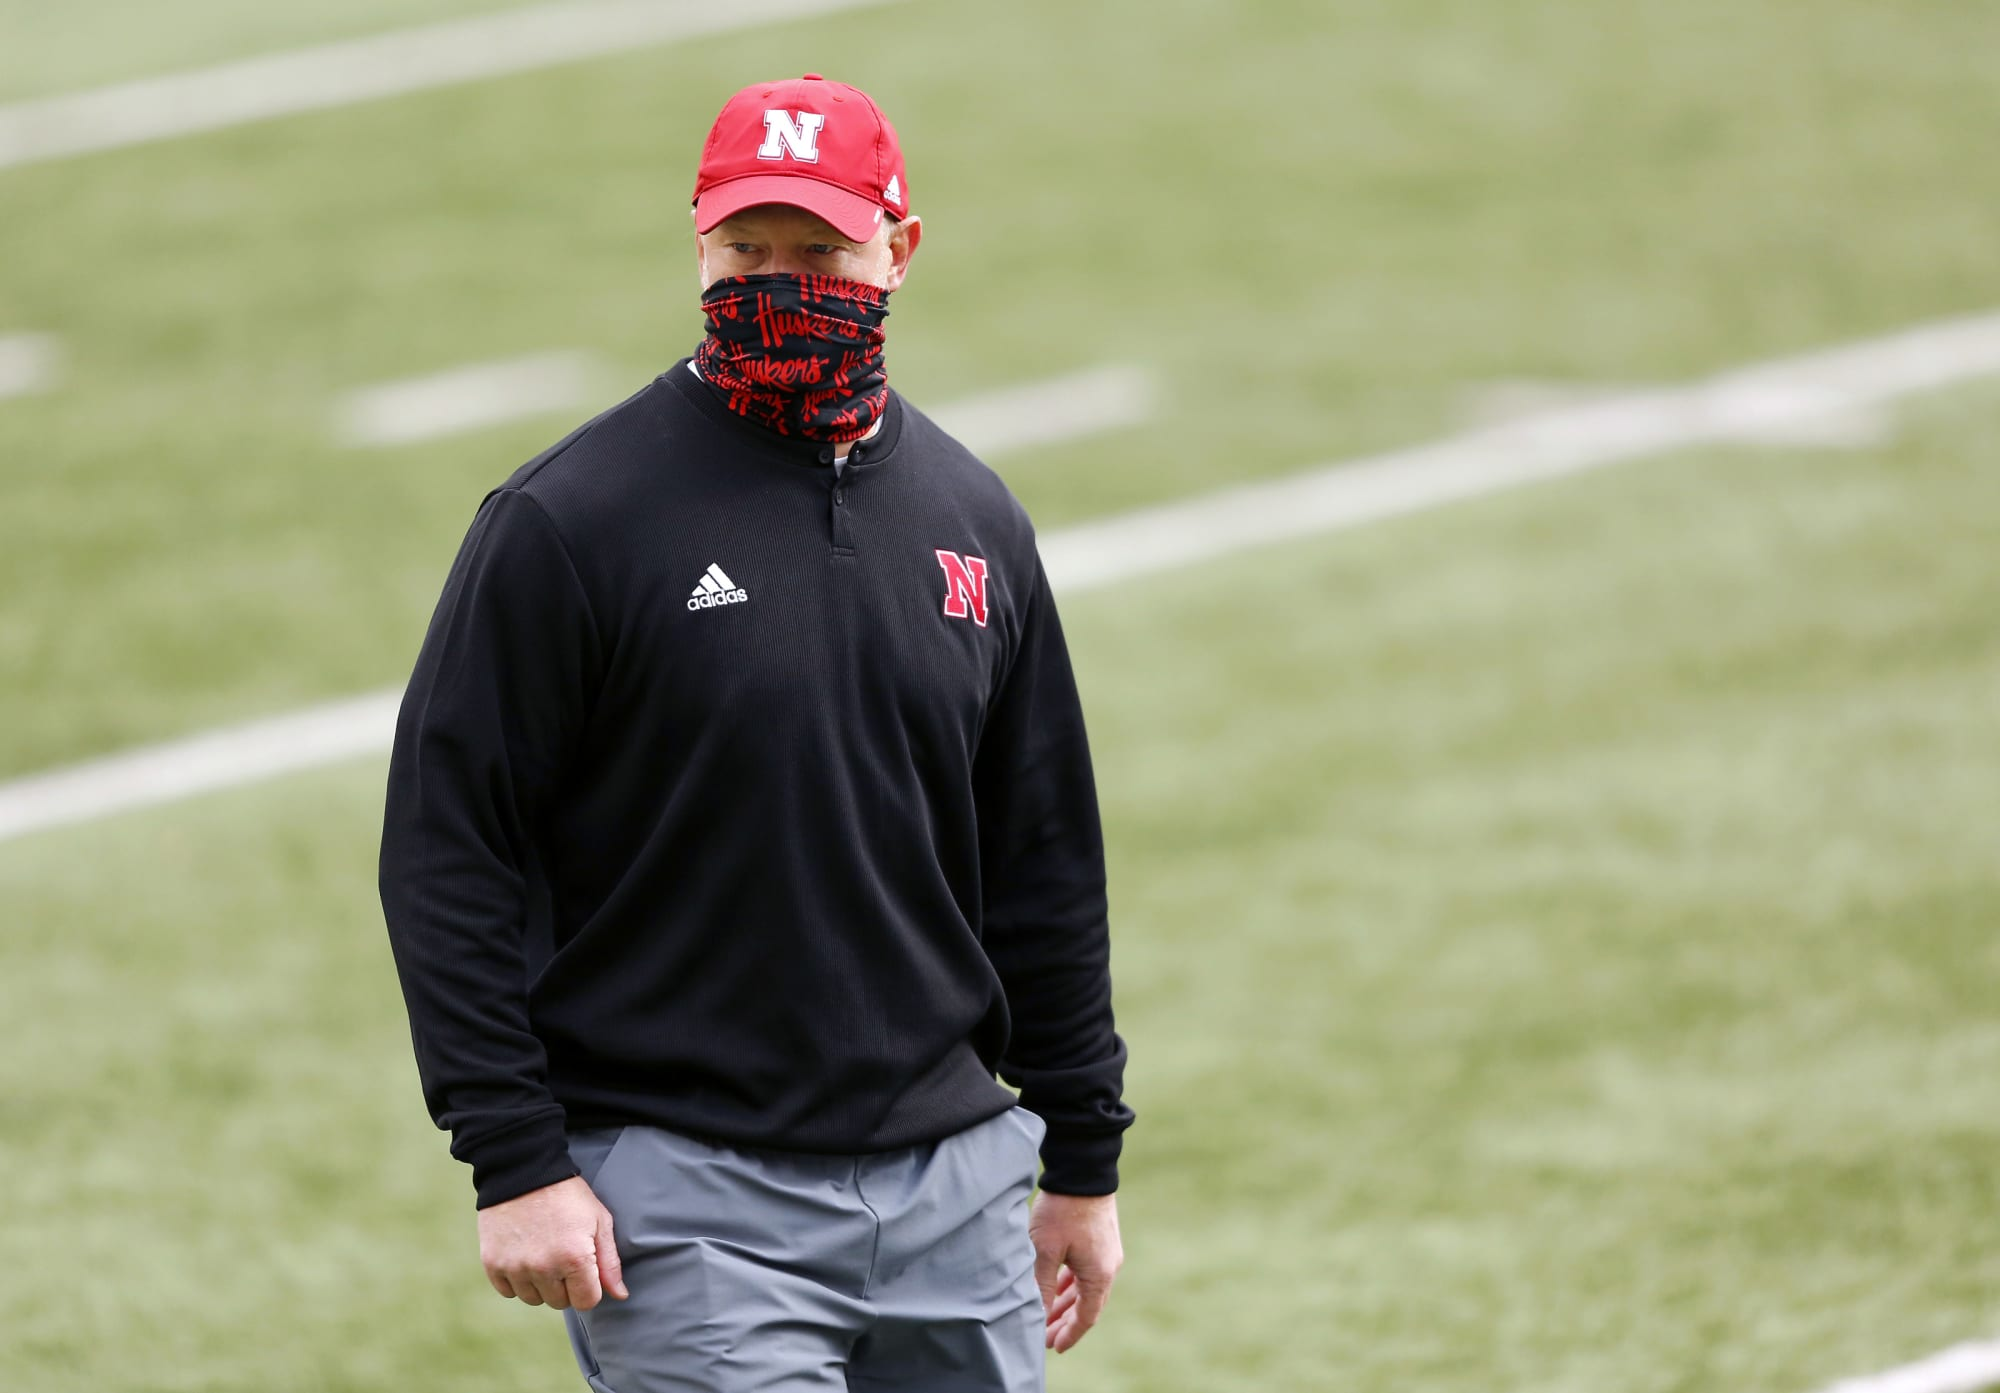 Nebraska Football: Scott Frost shouldn't have commented on Luke McCaffrey